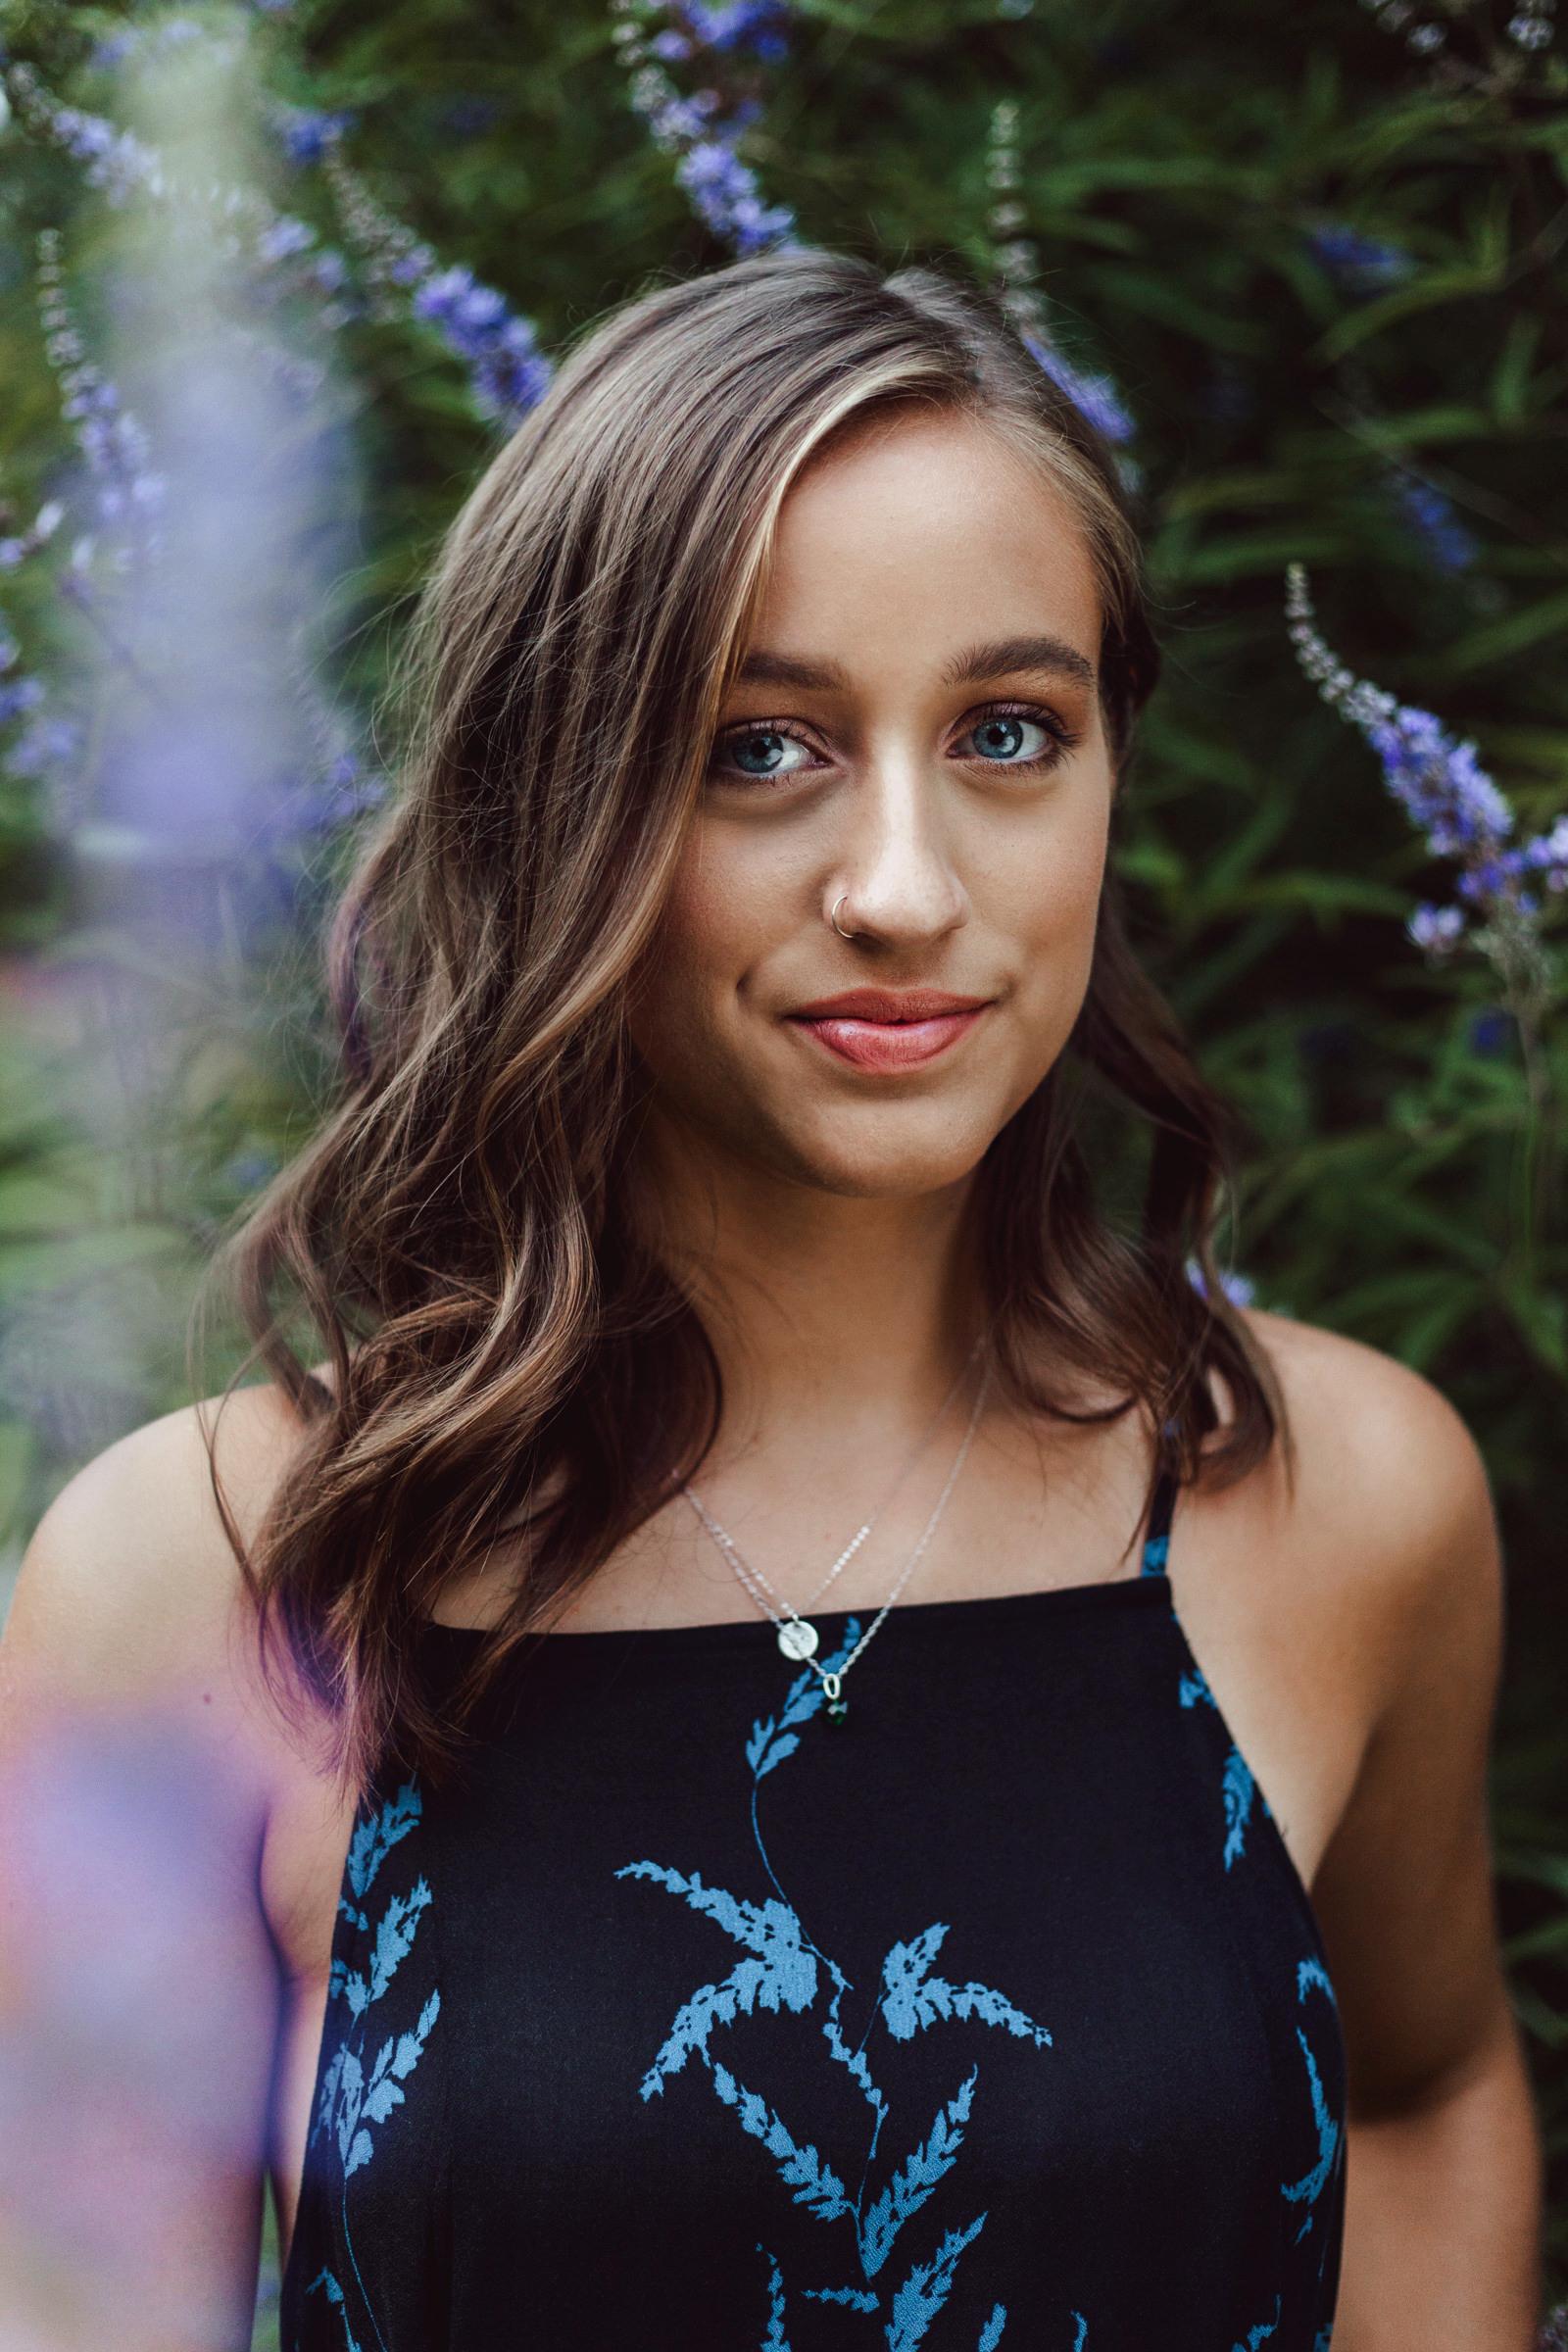 MeganSeniorPortraits-HaleyMcLainPhotography-12.JPG